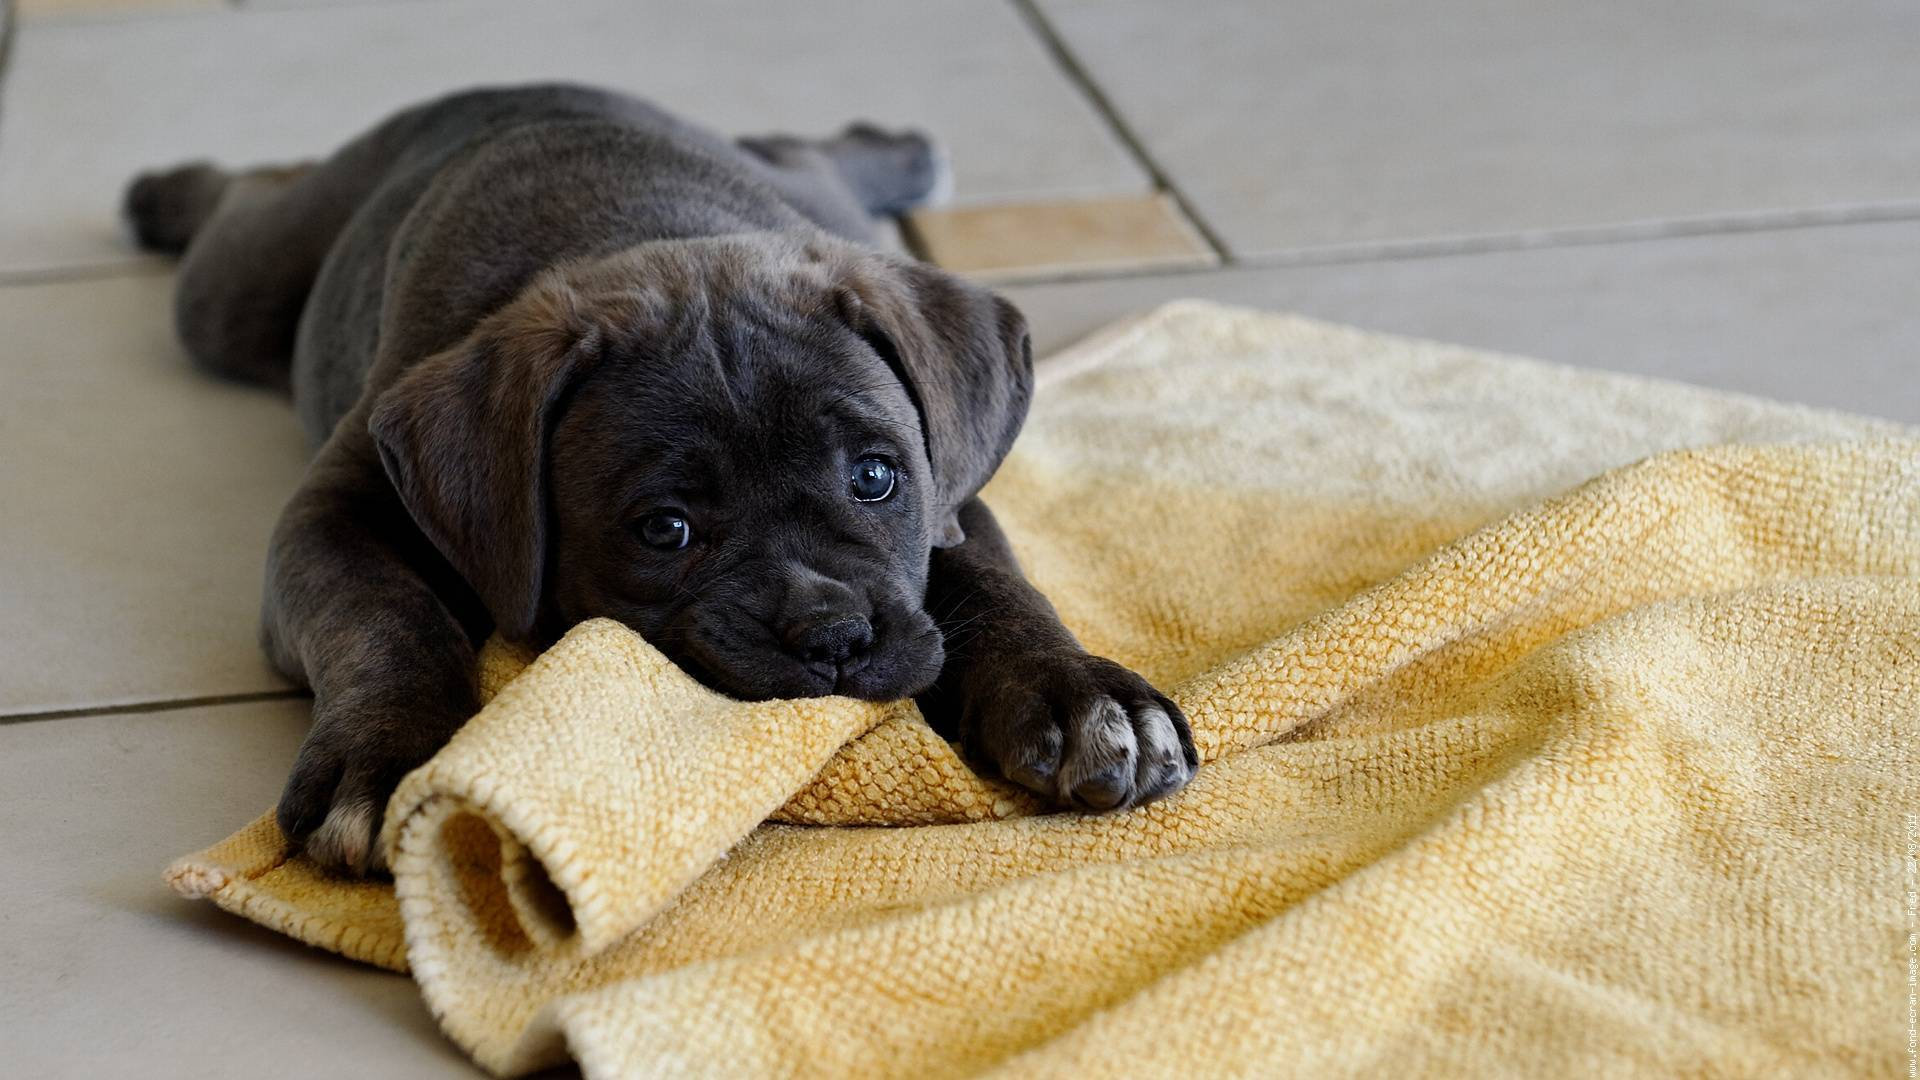 ᐉ когда можно отдавать щенка новым хозяевам? - zoomanji.ru